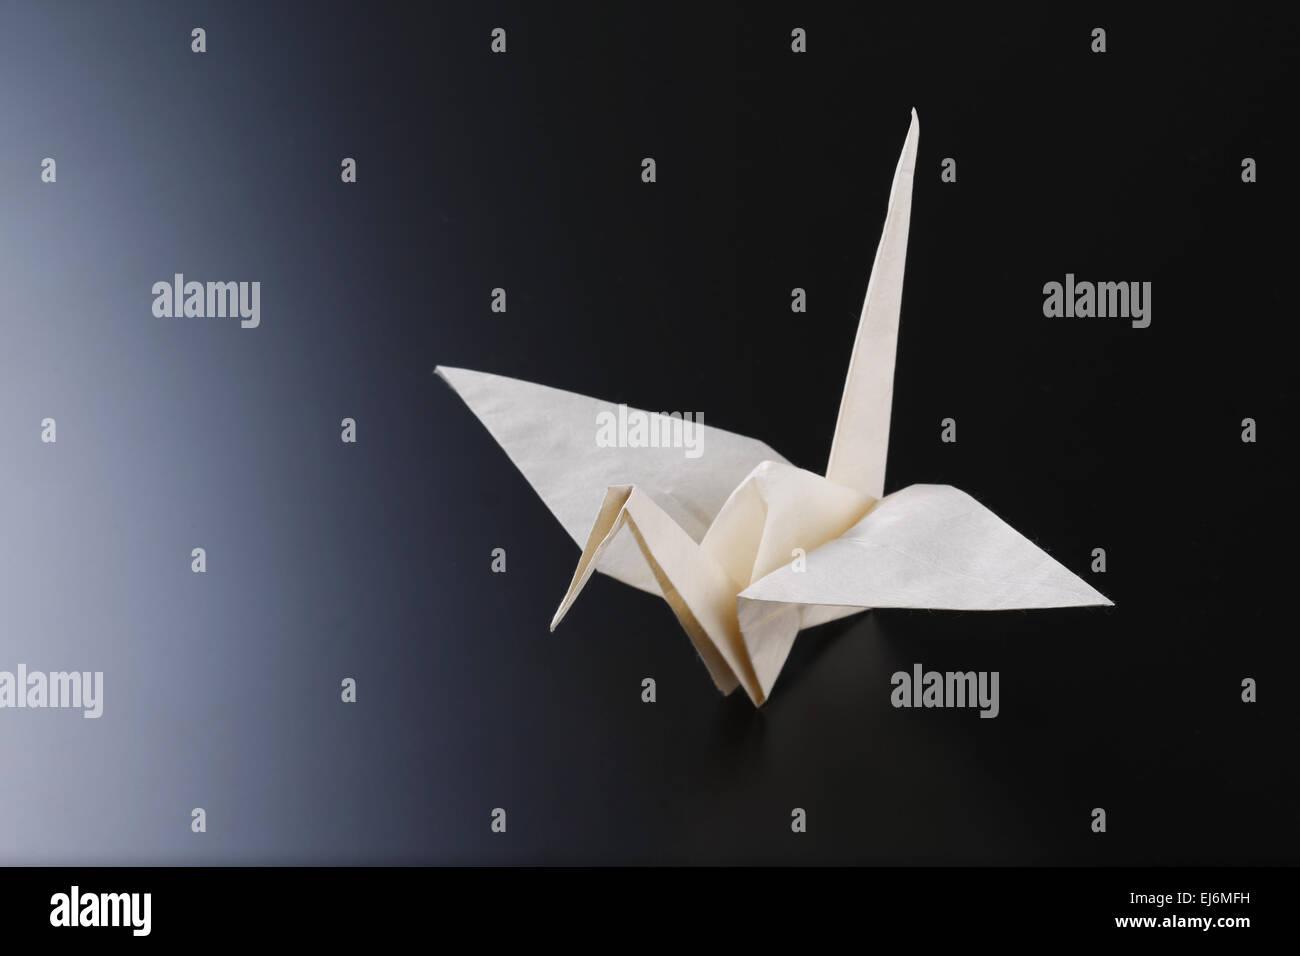 Japanische Büttenpapier Kran Stockbild